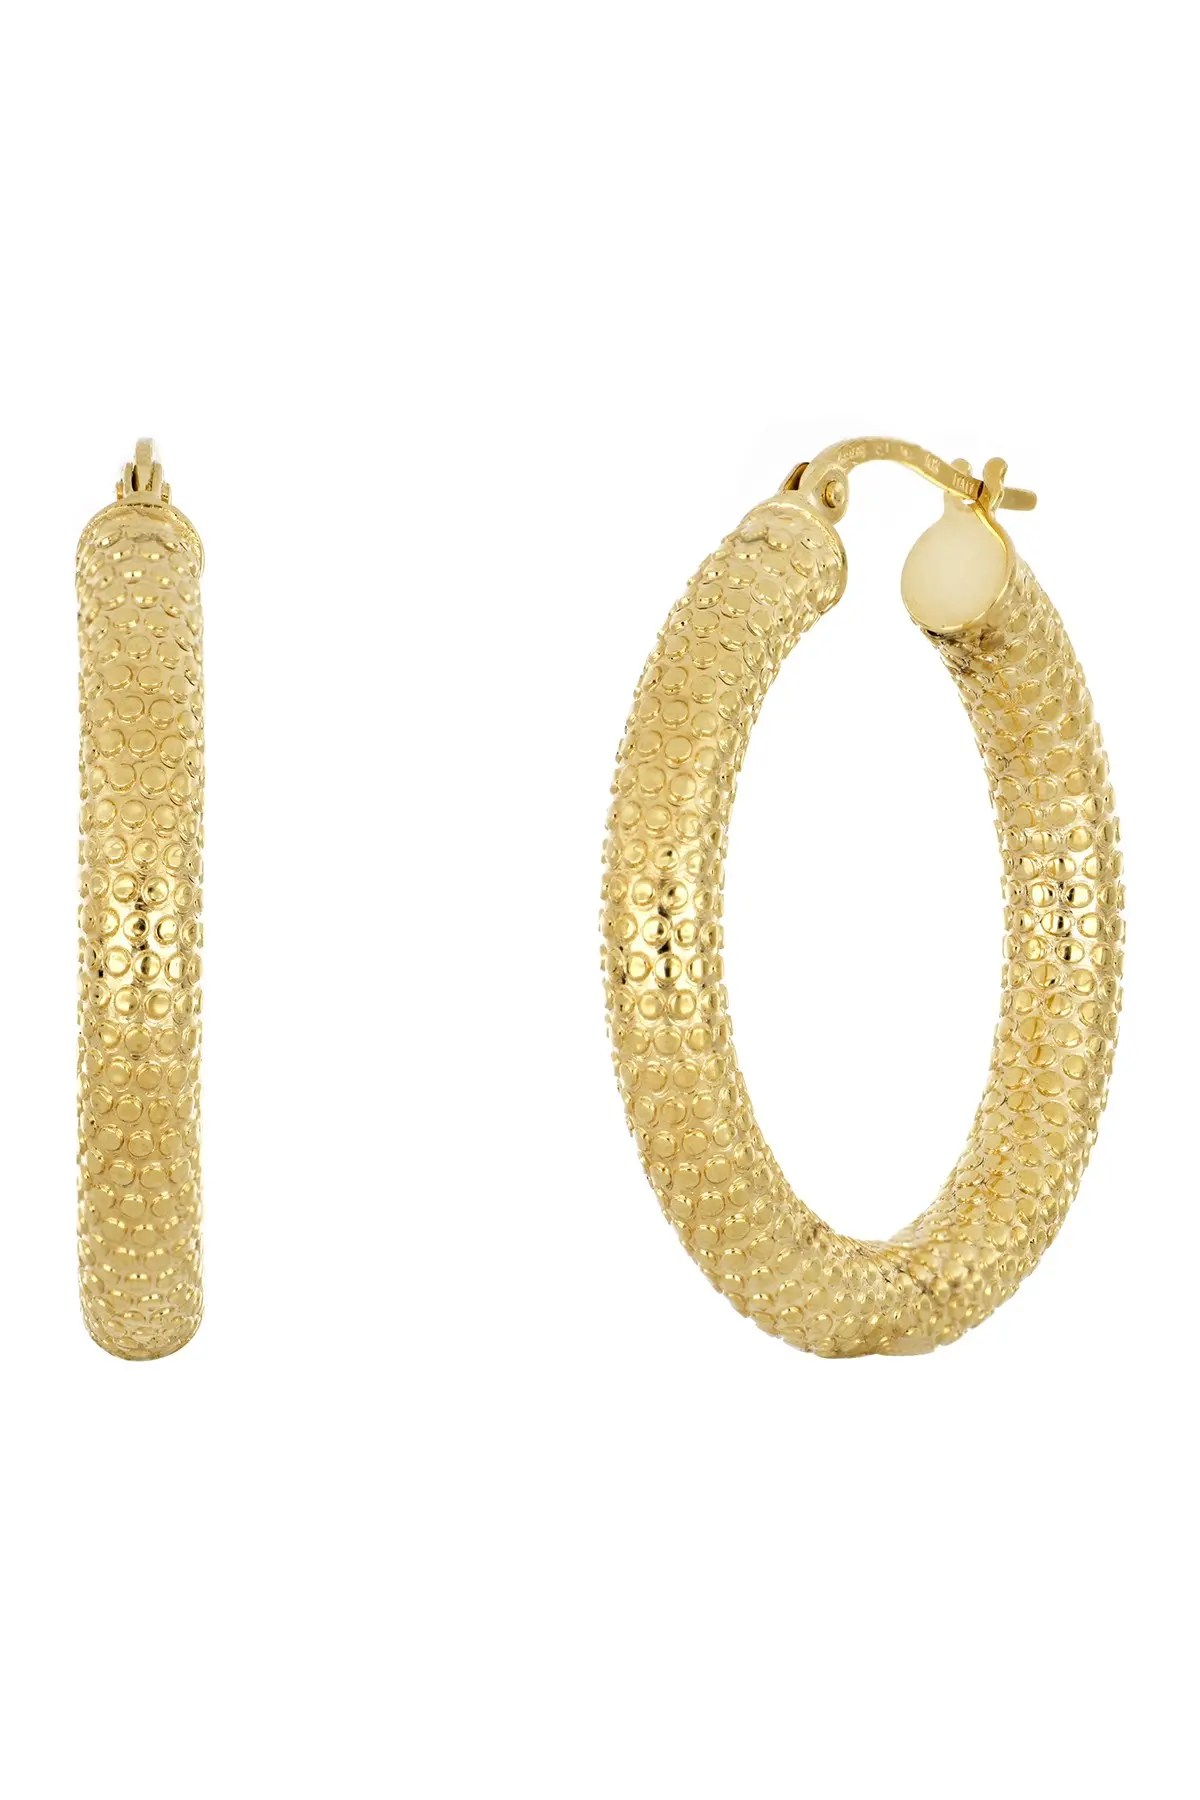 bony levy 14k yellow gold textured 20mm hoop earrings nordstrom rack